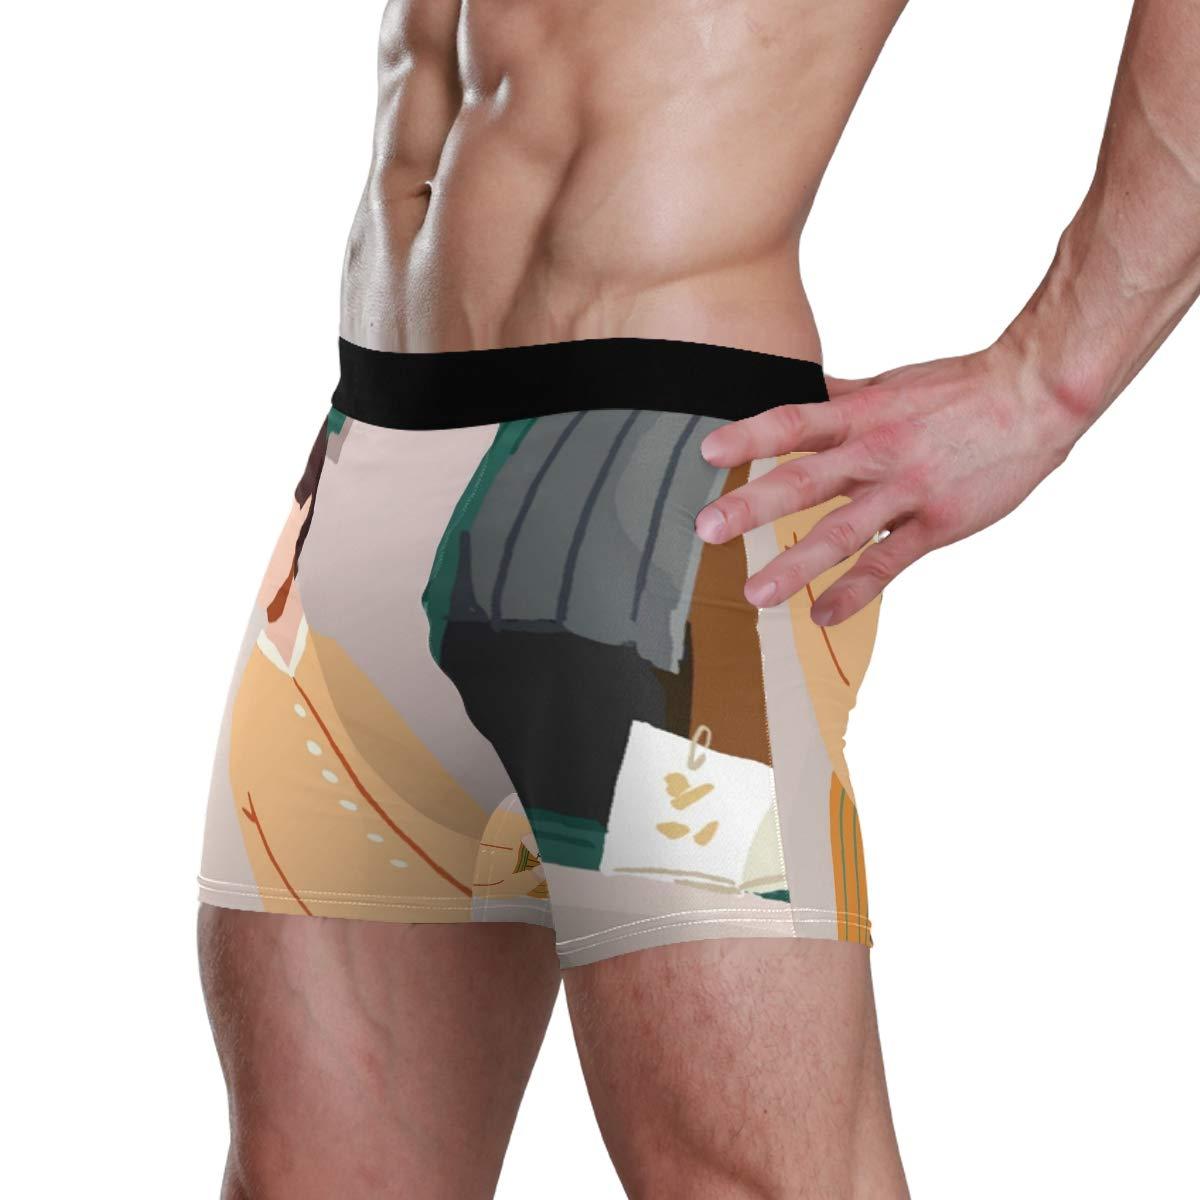 White Collar Vipsk Seamless Stretch Mens Polyester Boxer Briefs Underwear 1-Pack Set